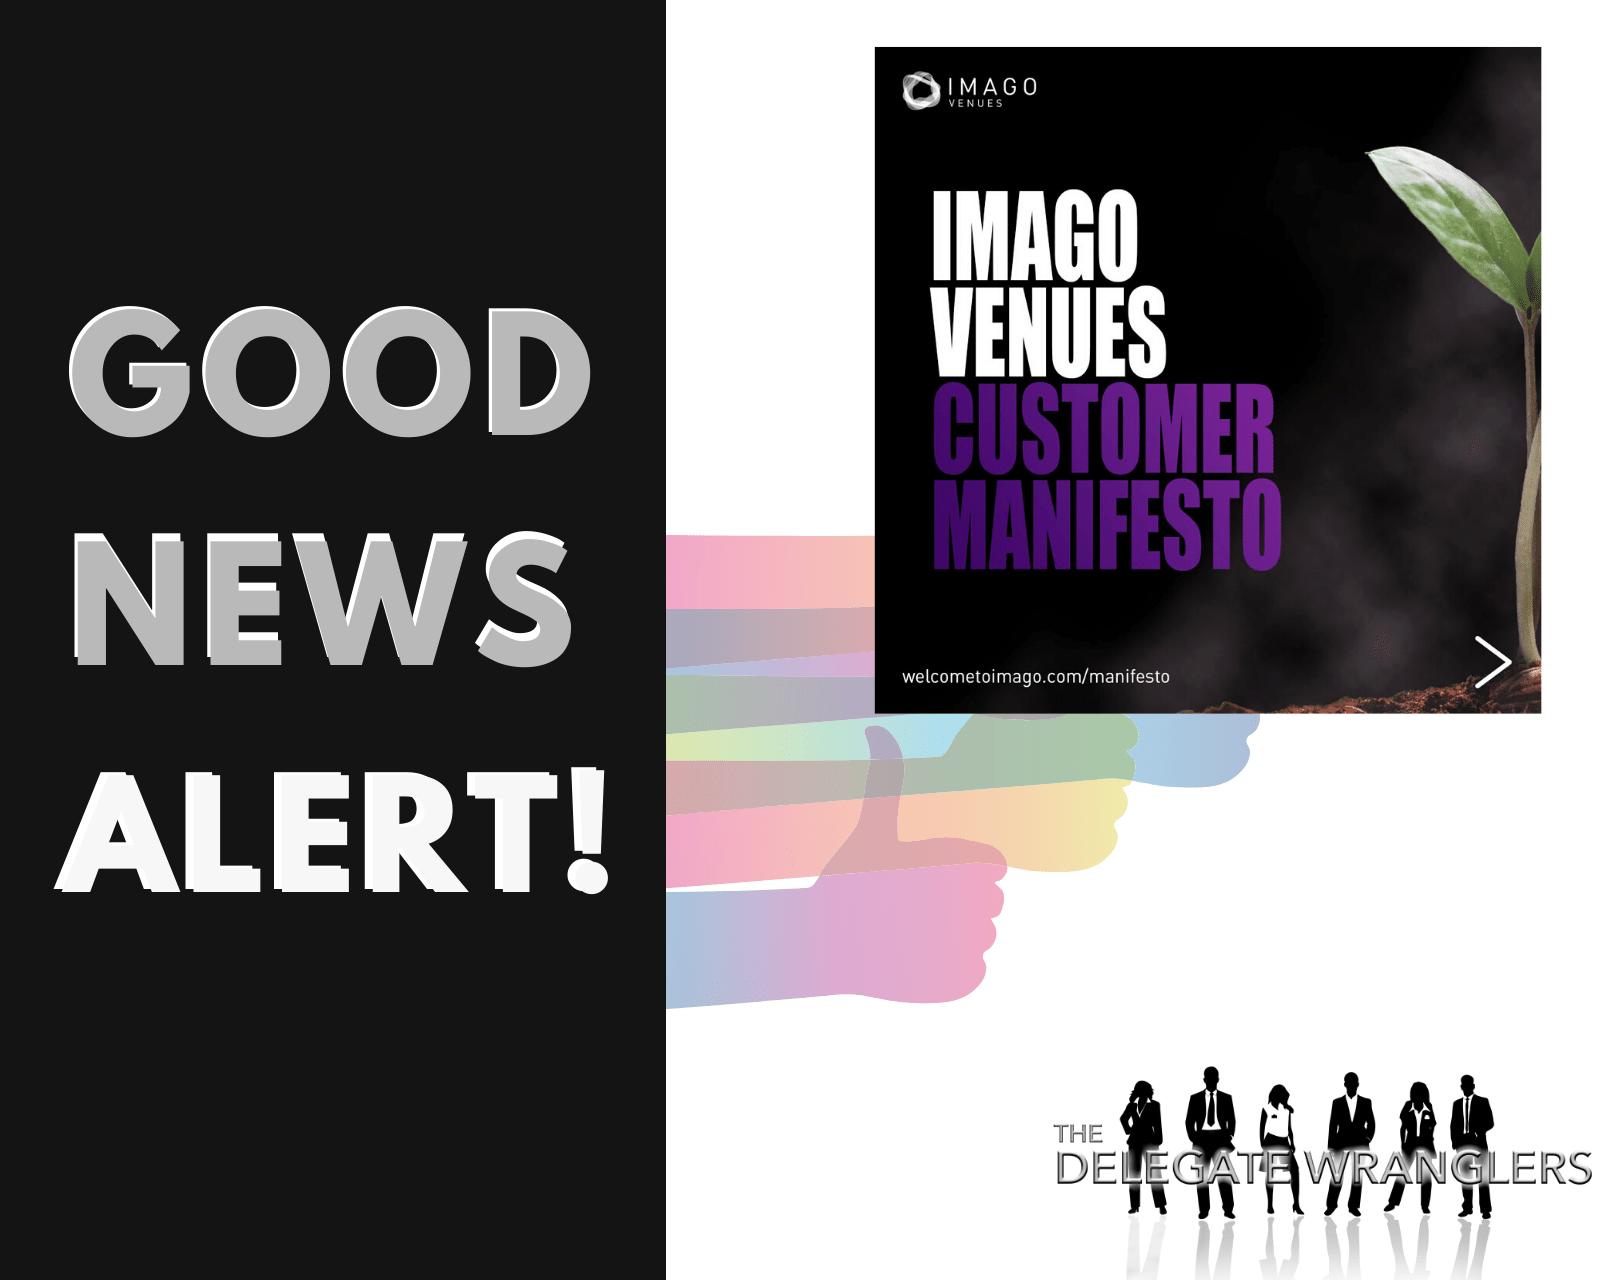 Imago Venues launch Customer Manifesto